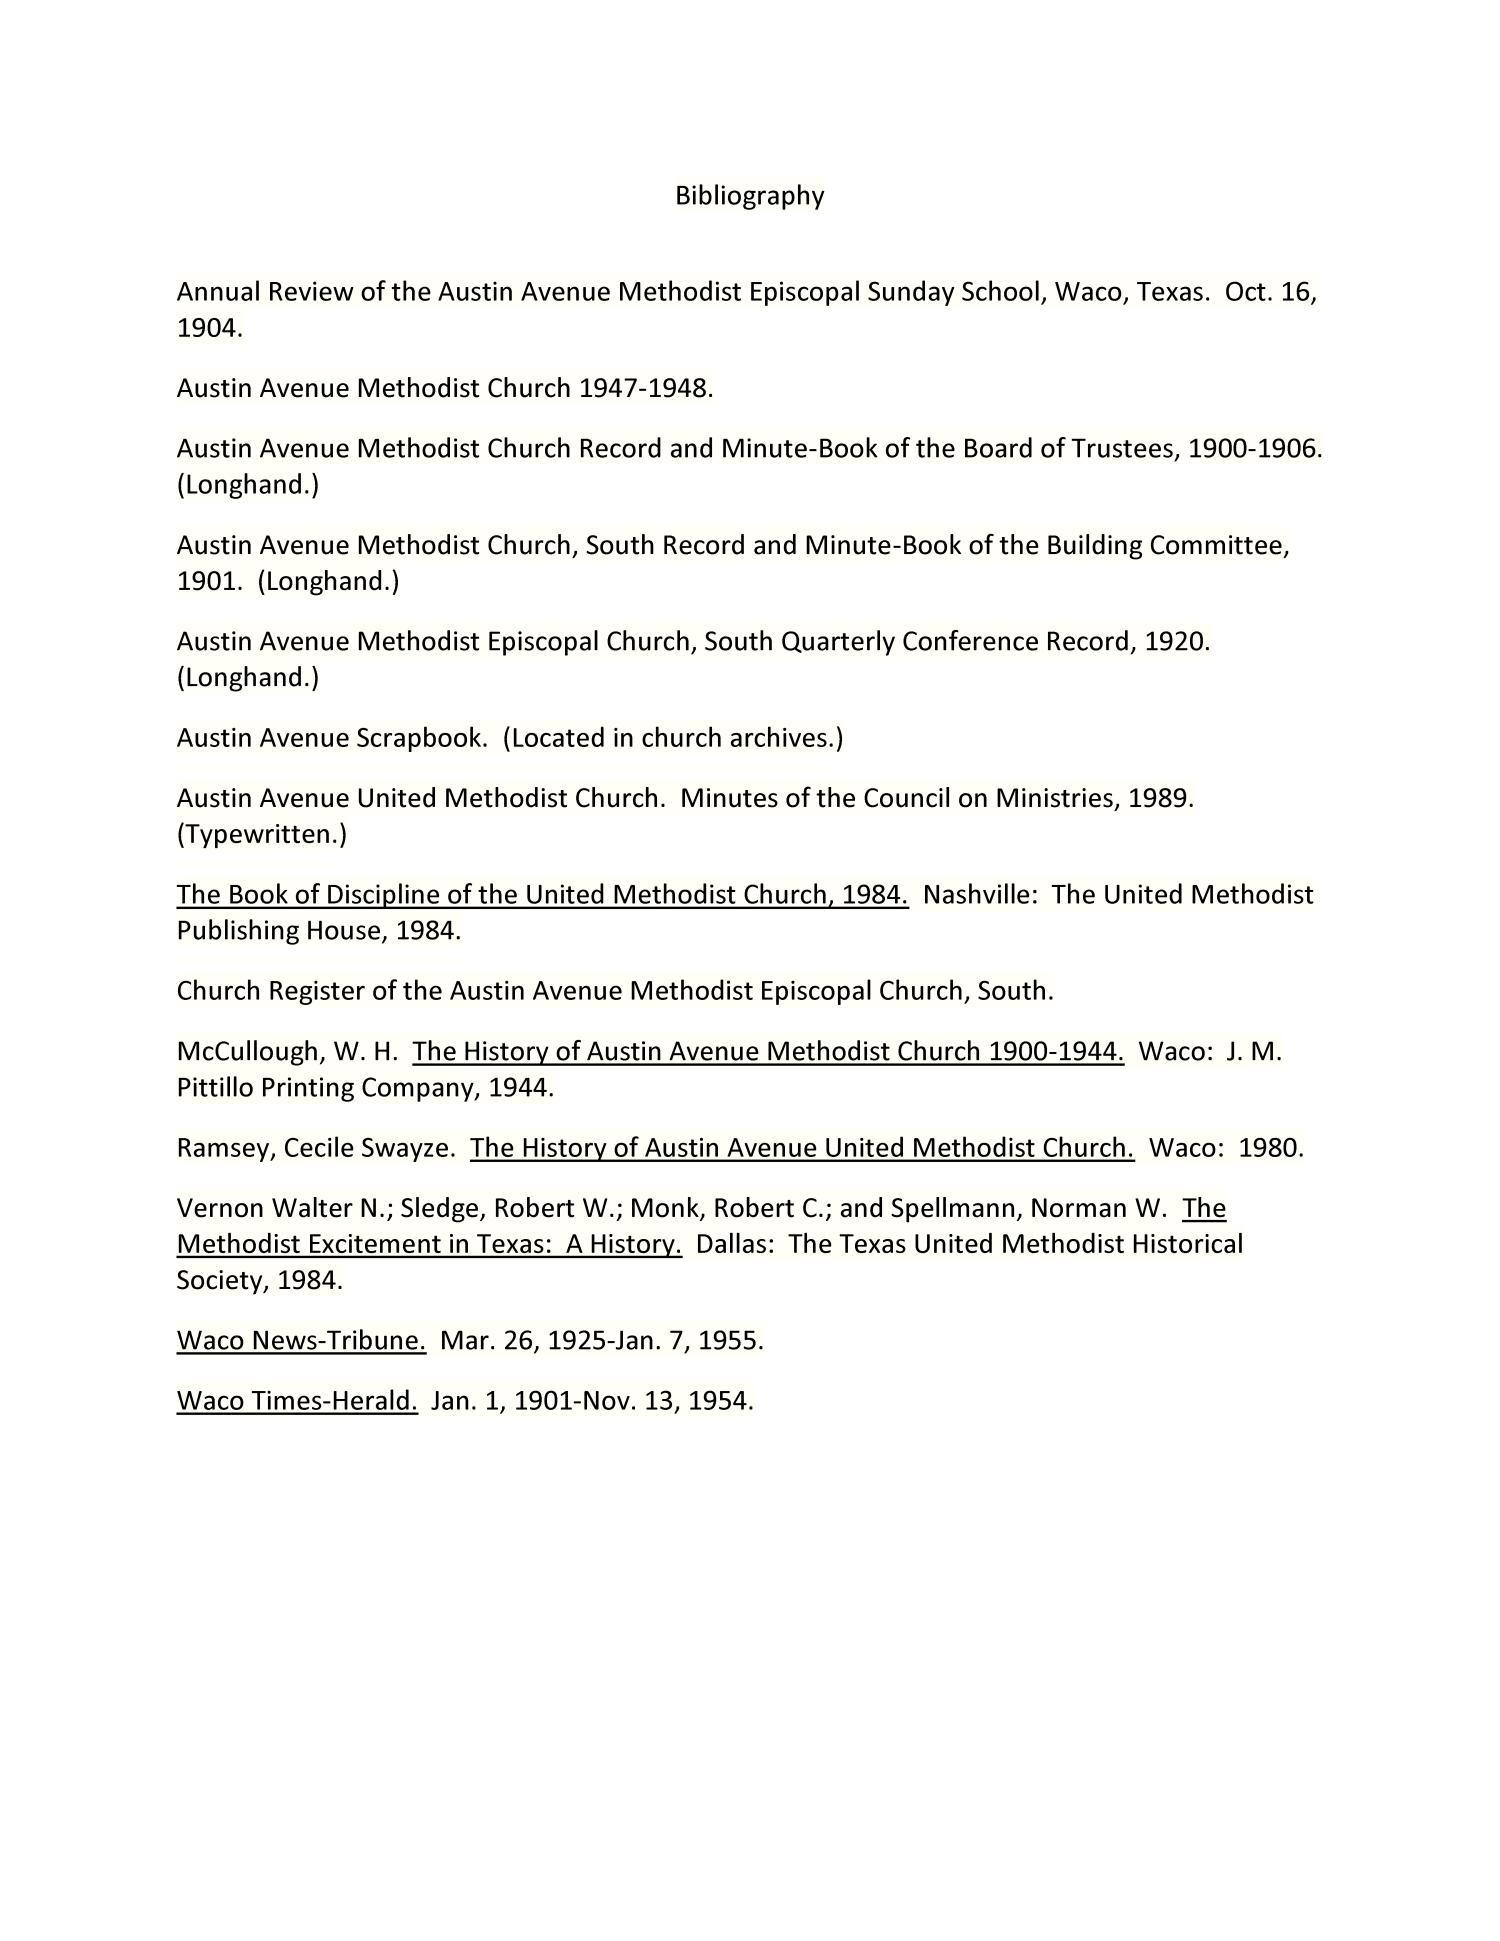 A Brief History of The Austin Avenue United Methodist Church